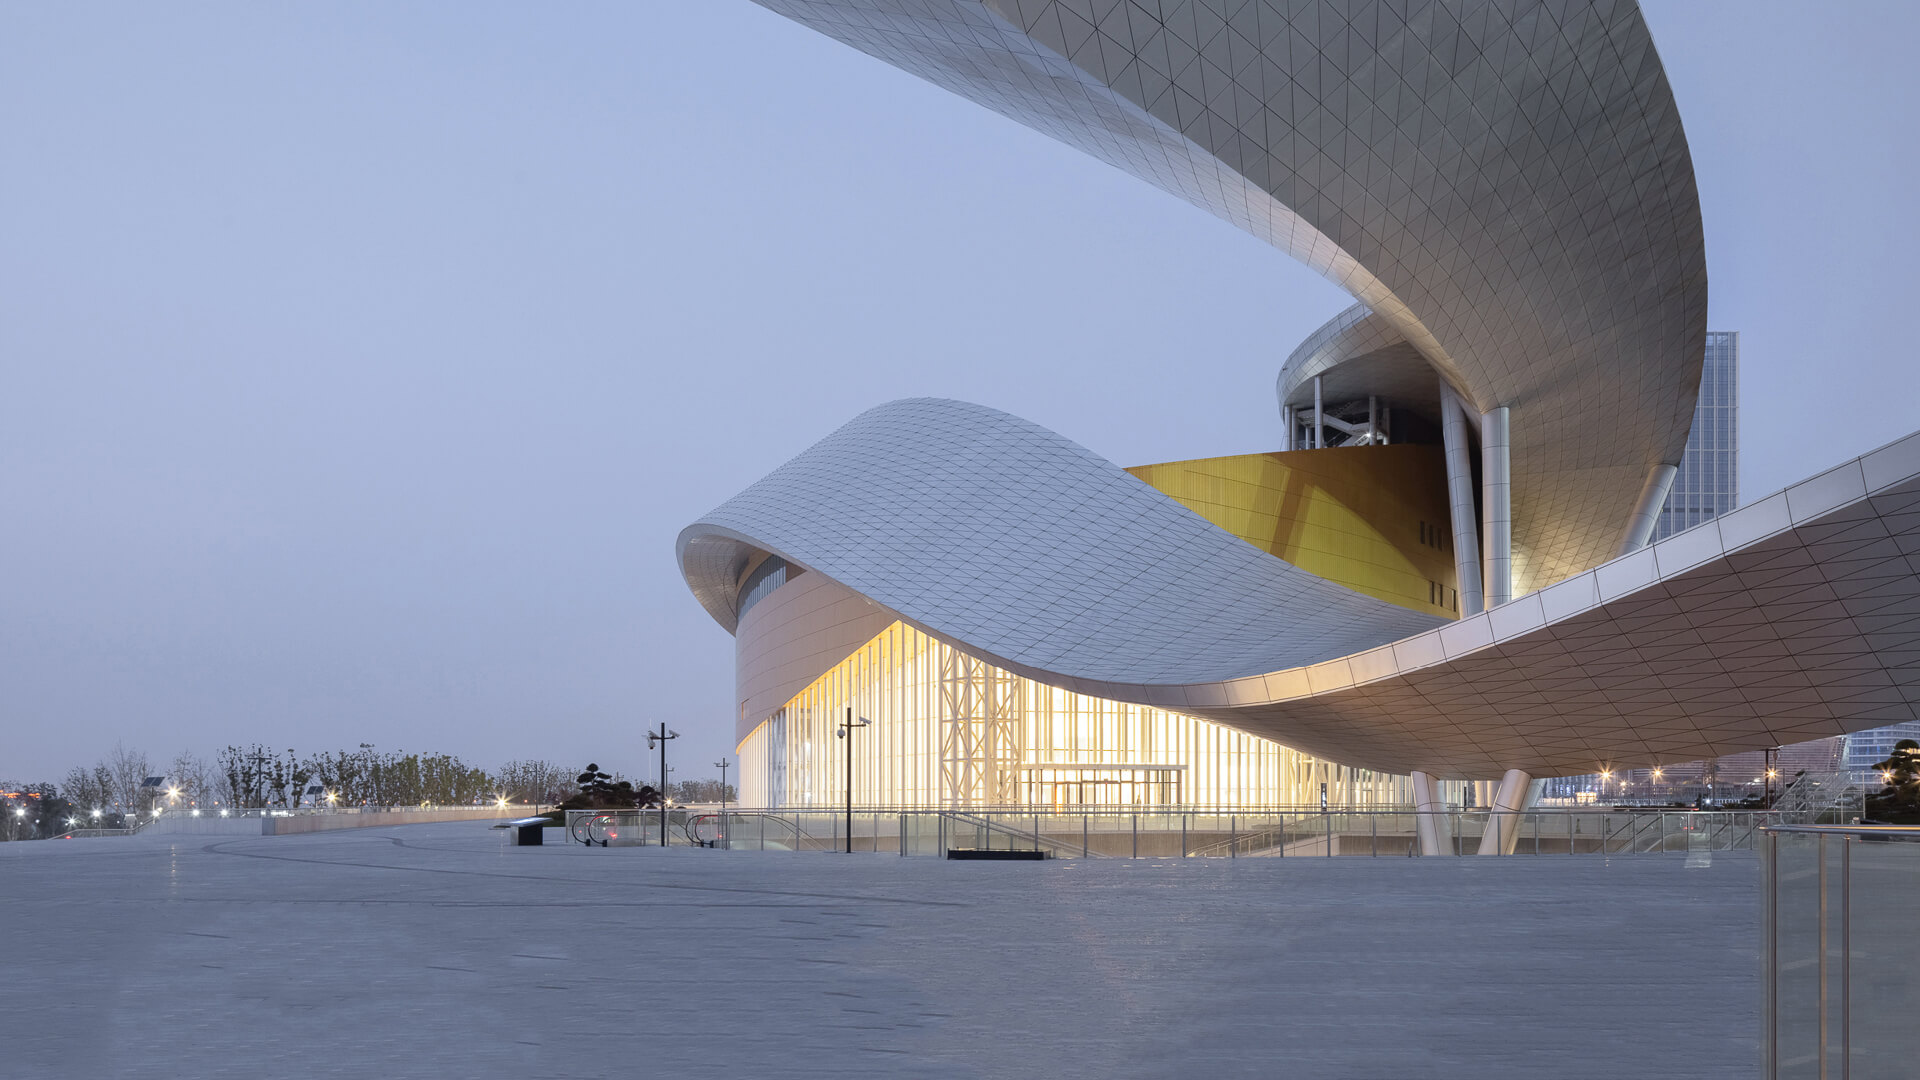 Christian de Portzamparc wraps Suzhou Bay Cultural Centre in a swirling ribbon